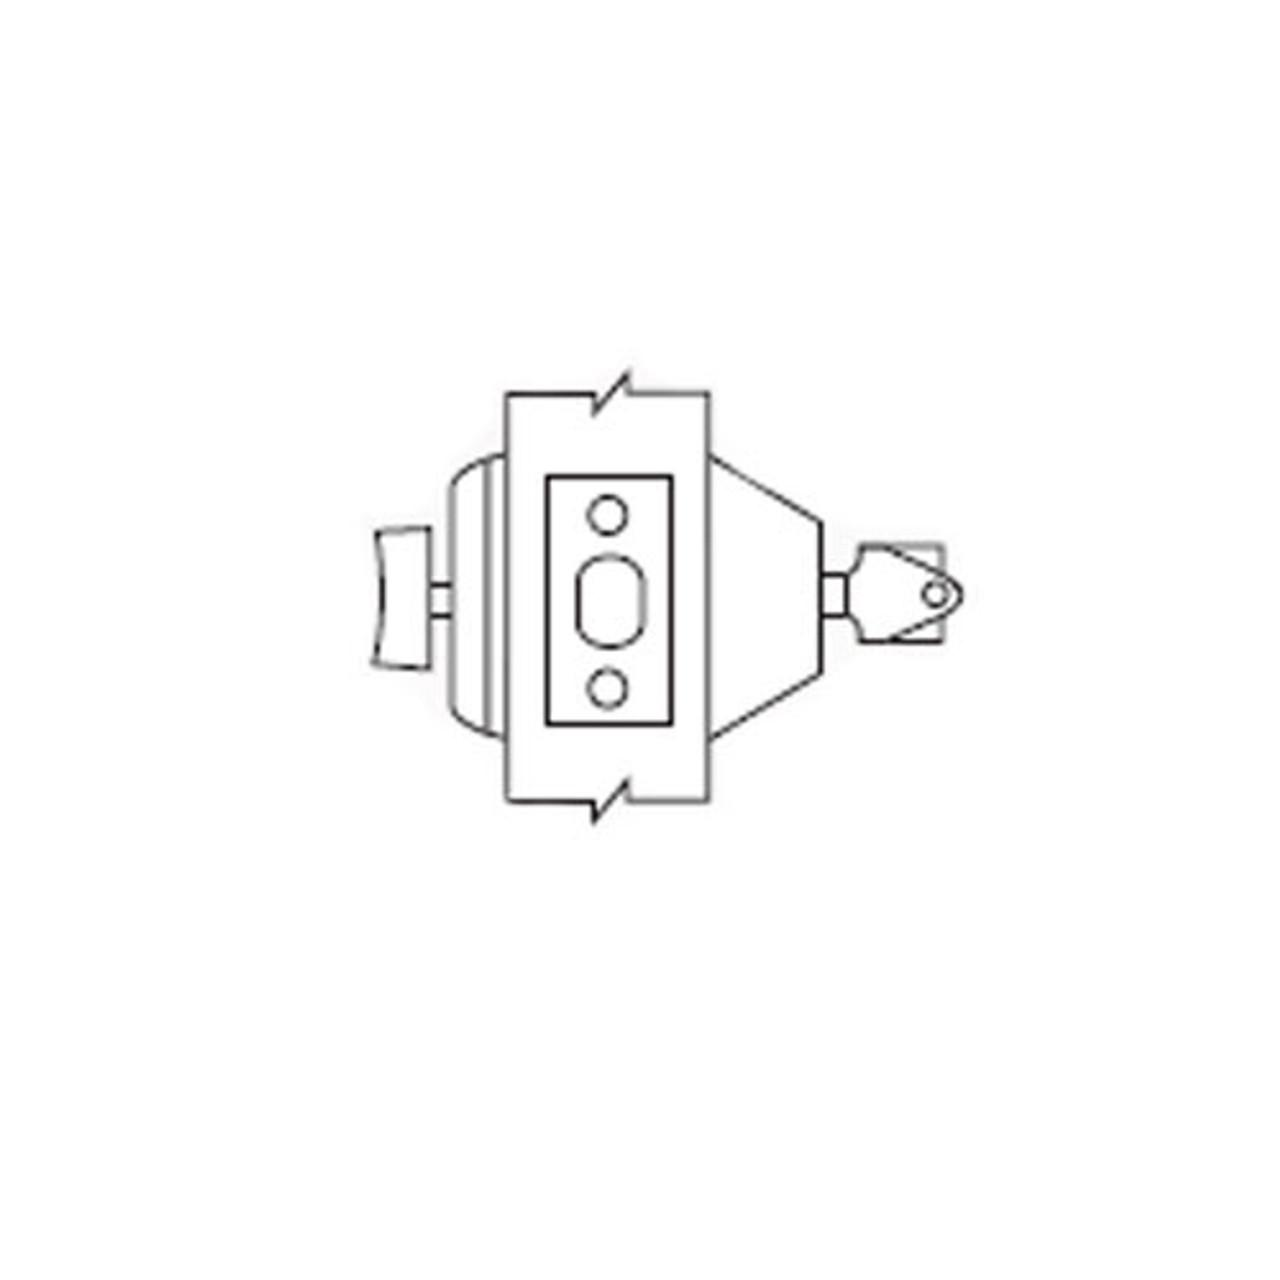 medium resolution of d61 10b arrow lock d series deadbolt single cylinder with thumbturn in dark oxidized satin